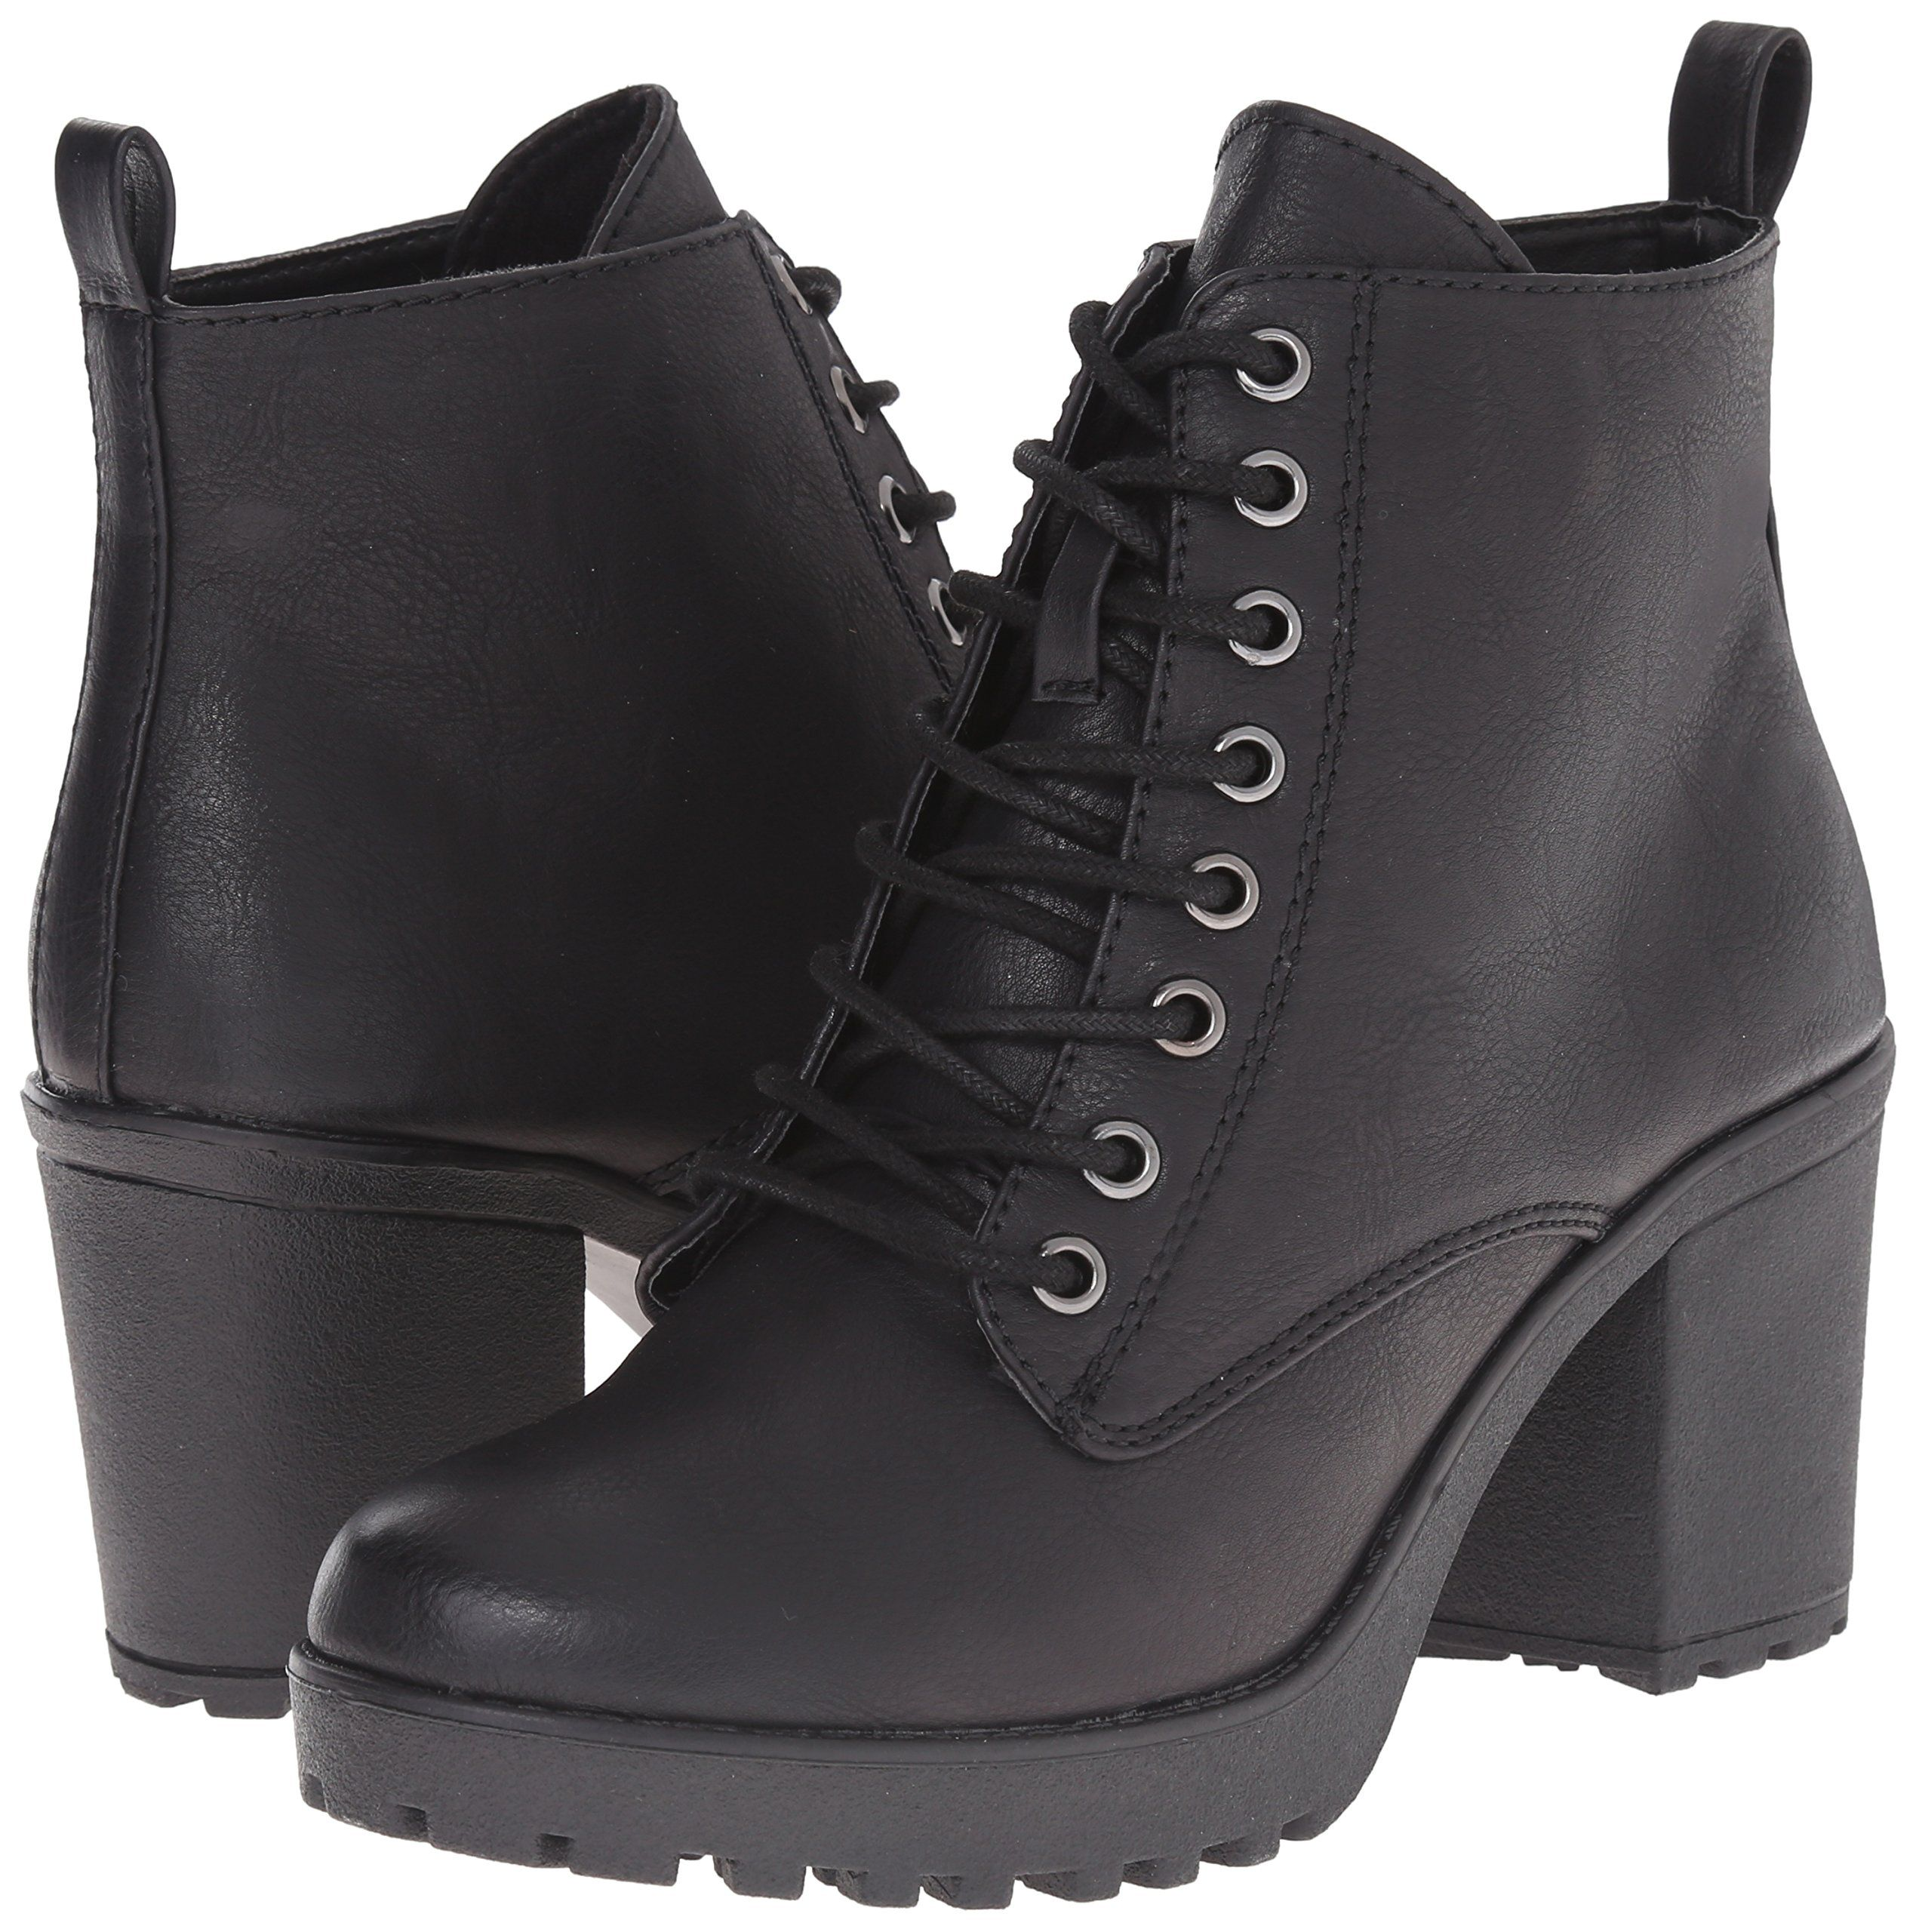 Amazon.com | MIA Women's Kat Combat Boot, Black, 6.5 M US | Ankle & Bootie